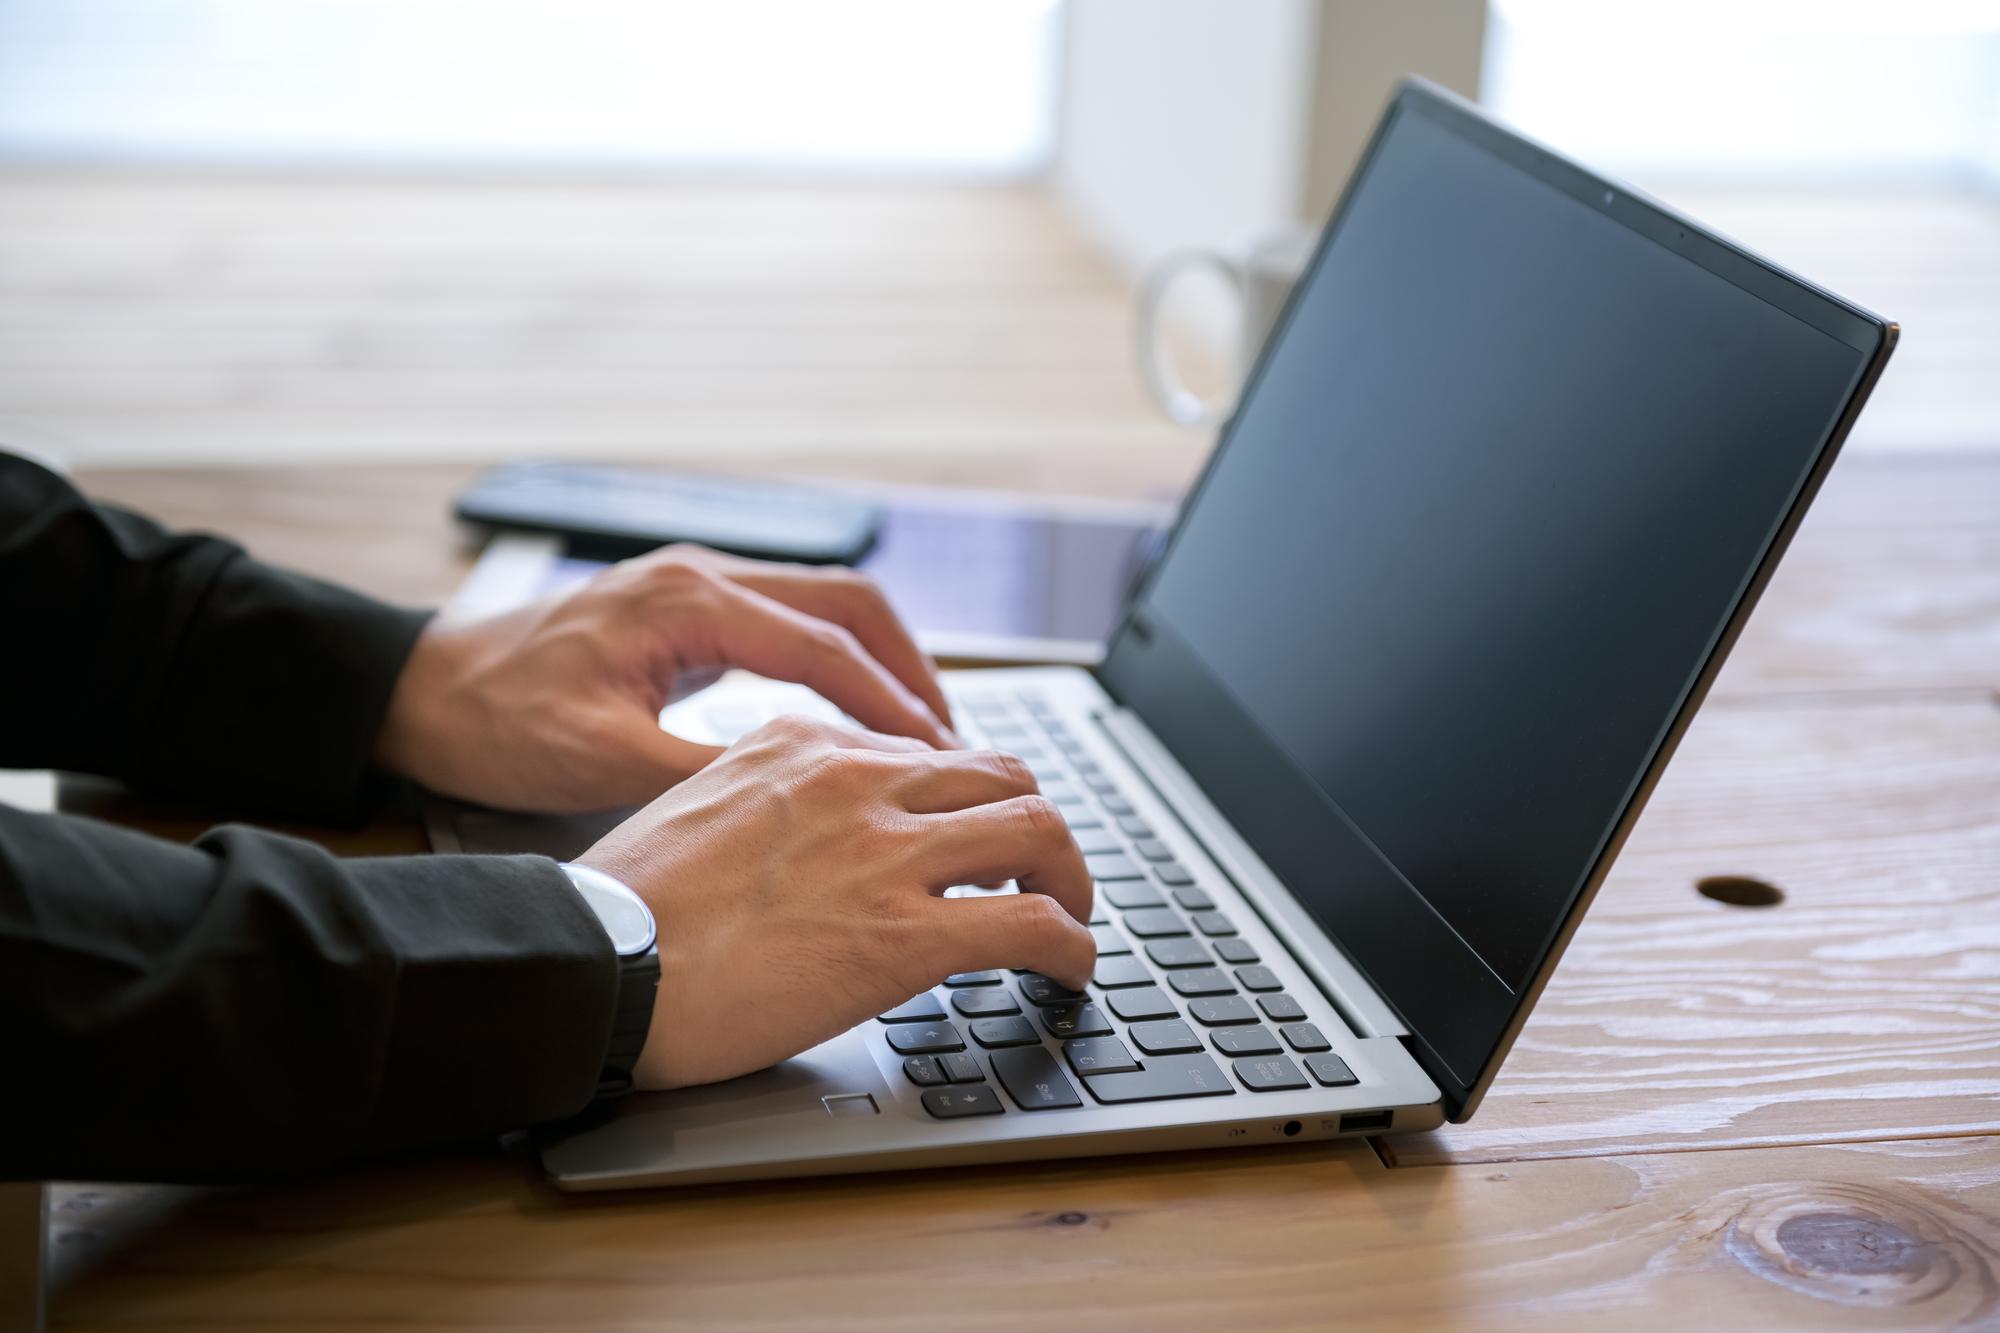 WEB記事などの削除は慎重に!企業の主義・主張だけでなく、ネットユーザーの心理にも配慮を